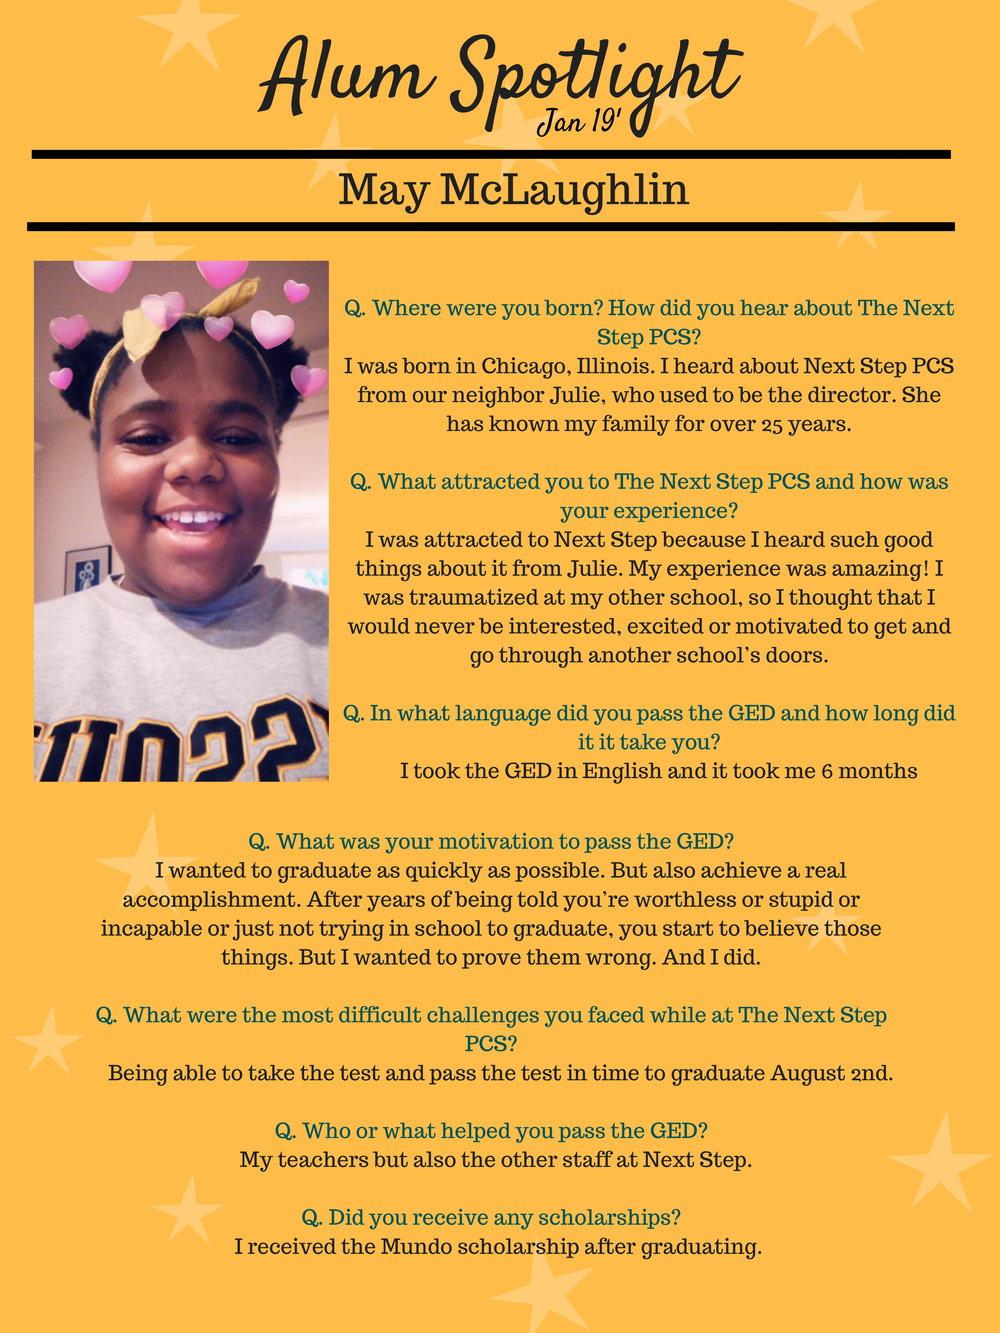 Alum_Spotlight_May_McLaughlin_1.jpg